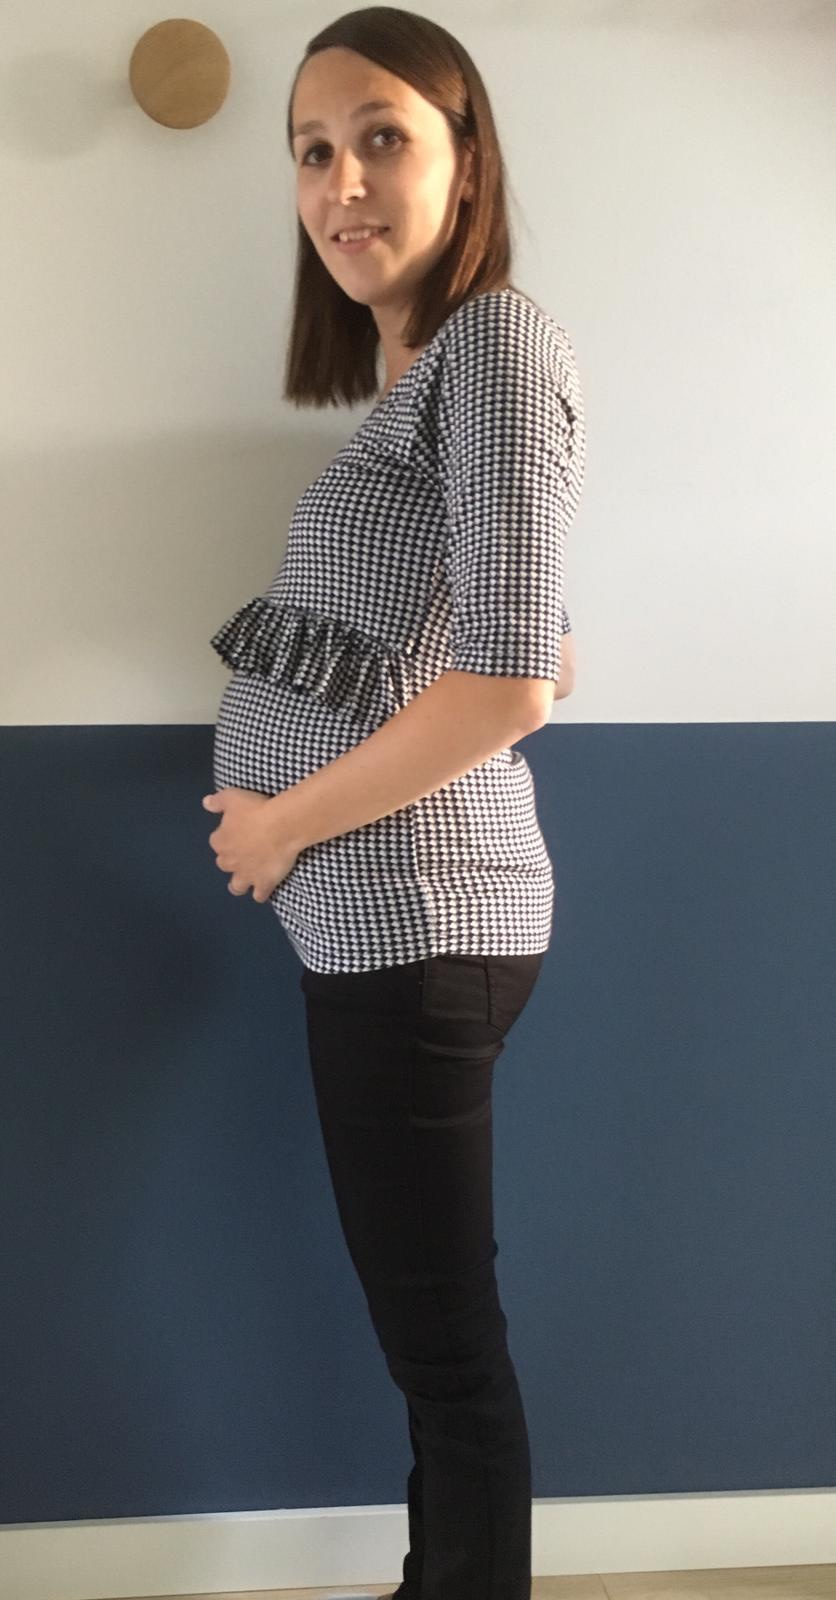 Basic Zwangerschapskleding.Waar Bestaat Bestond Jouw Zwangerschapskleding Uitzet Uit